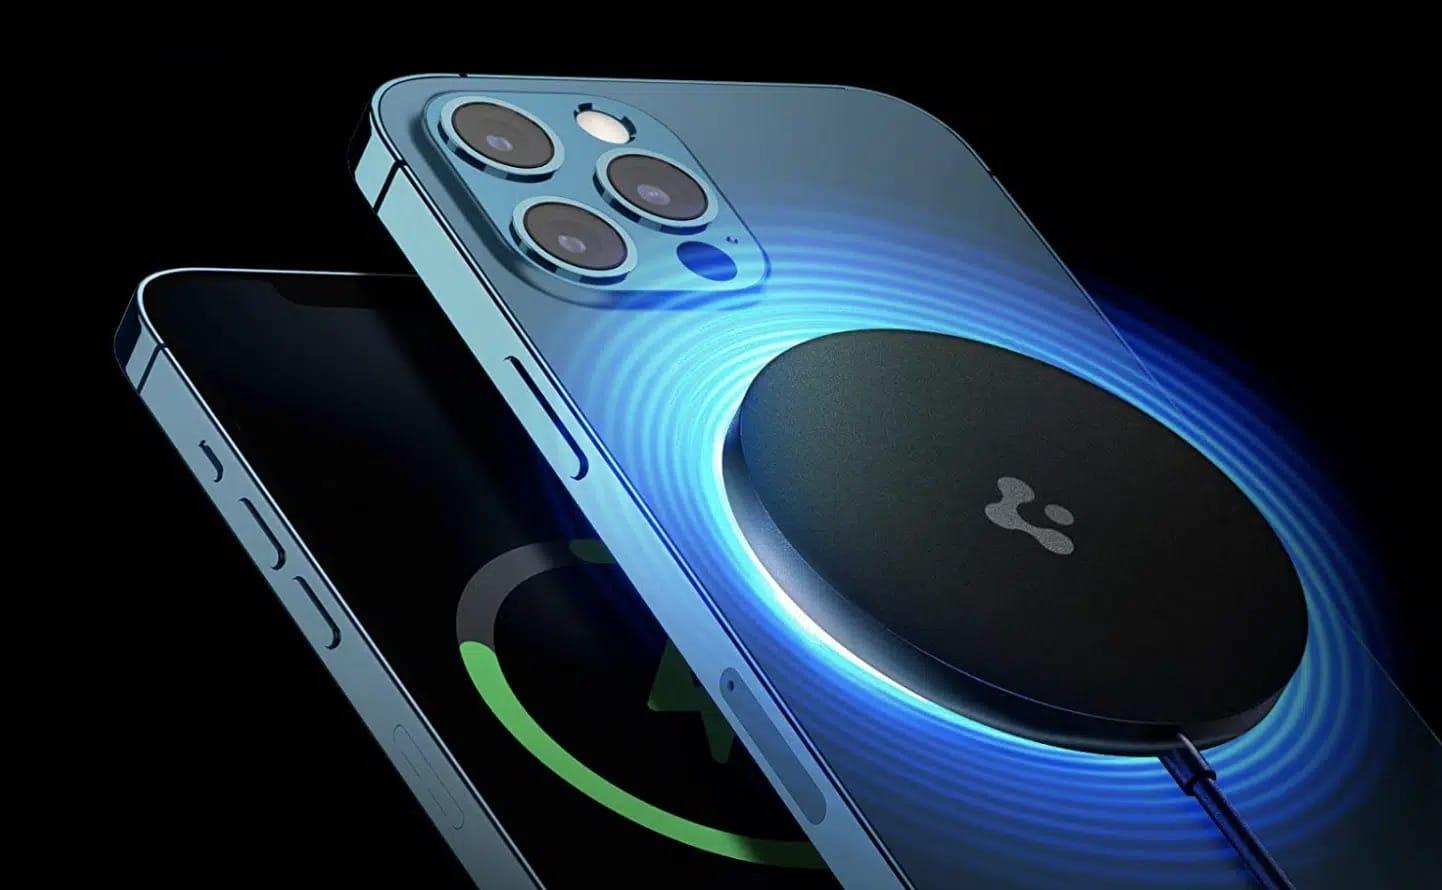 SpigenのiPhone 13/12シリーズ用ワイヤレス充電器が20%オフ